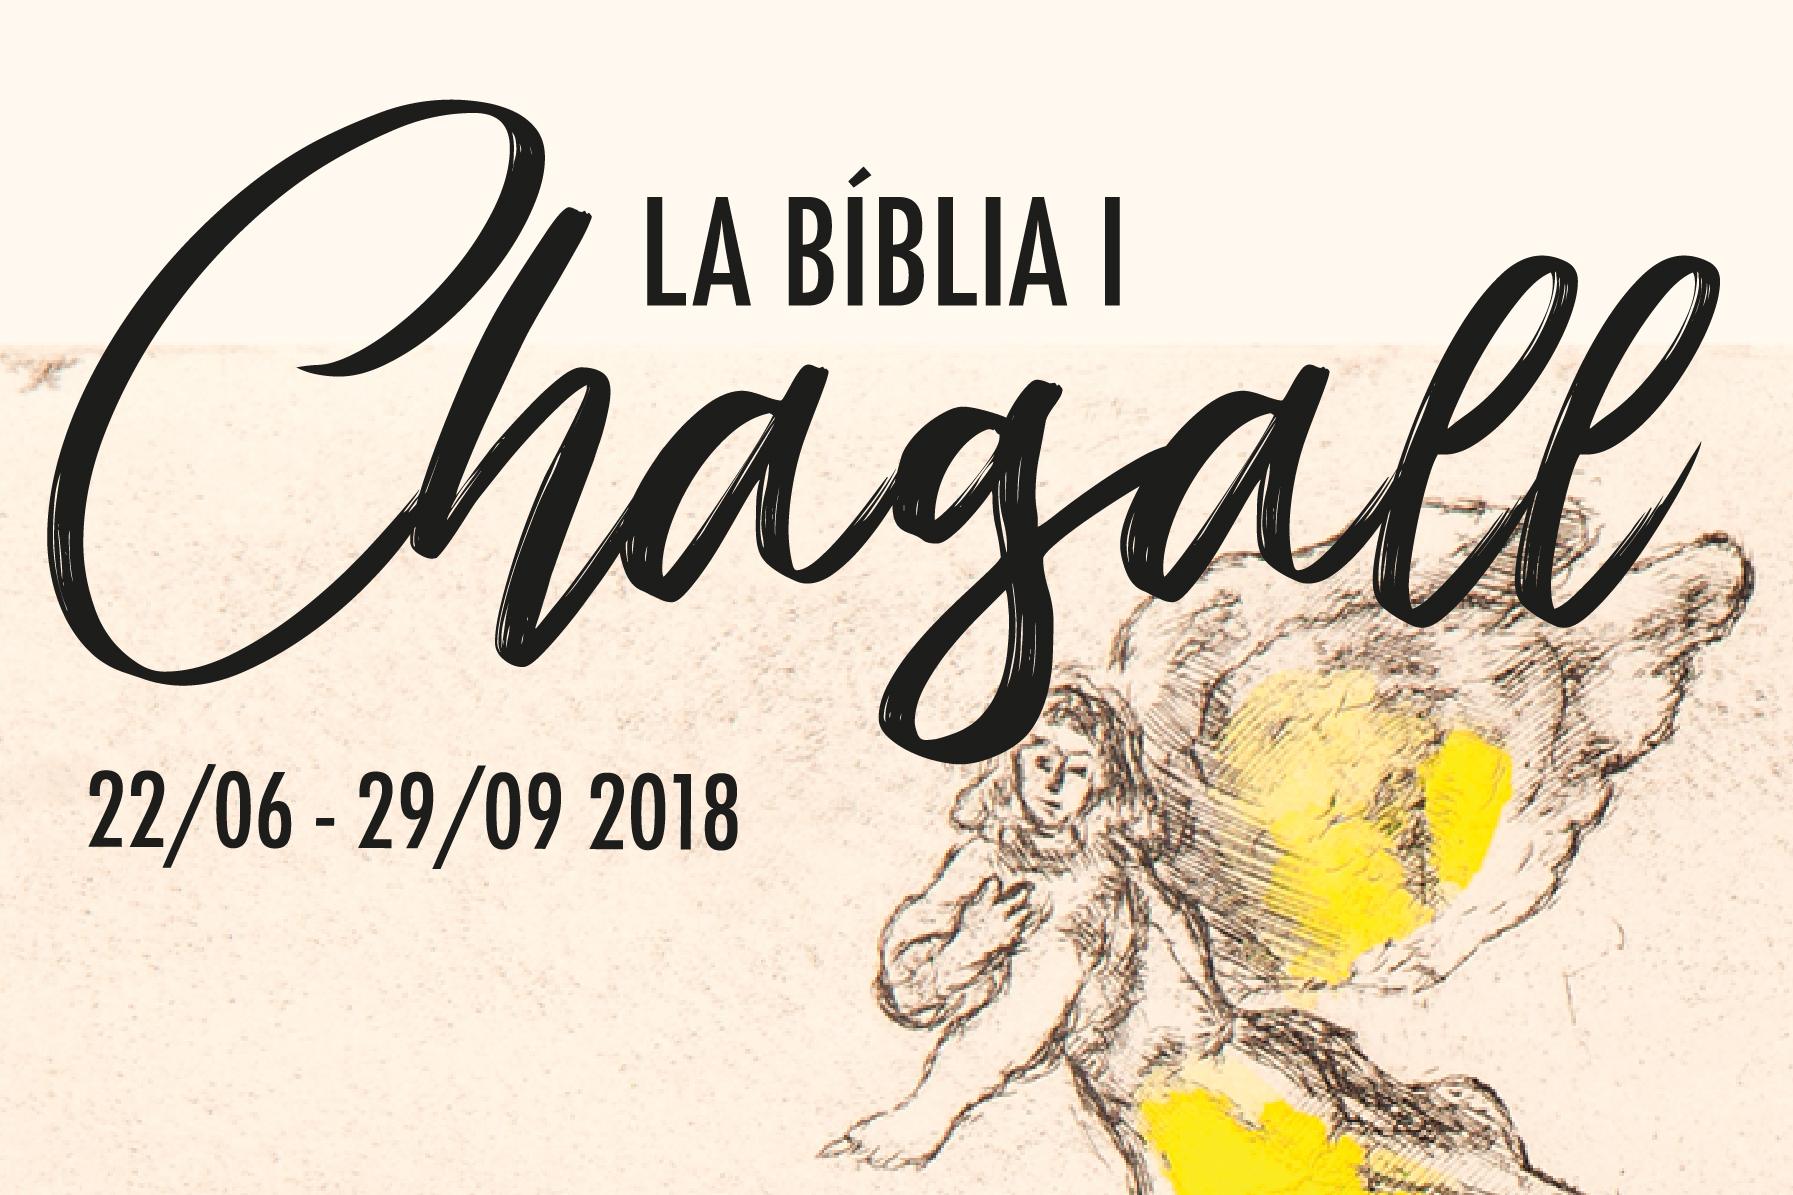 La Bíblia i Chagall